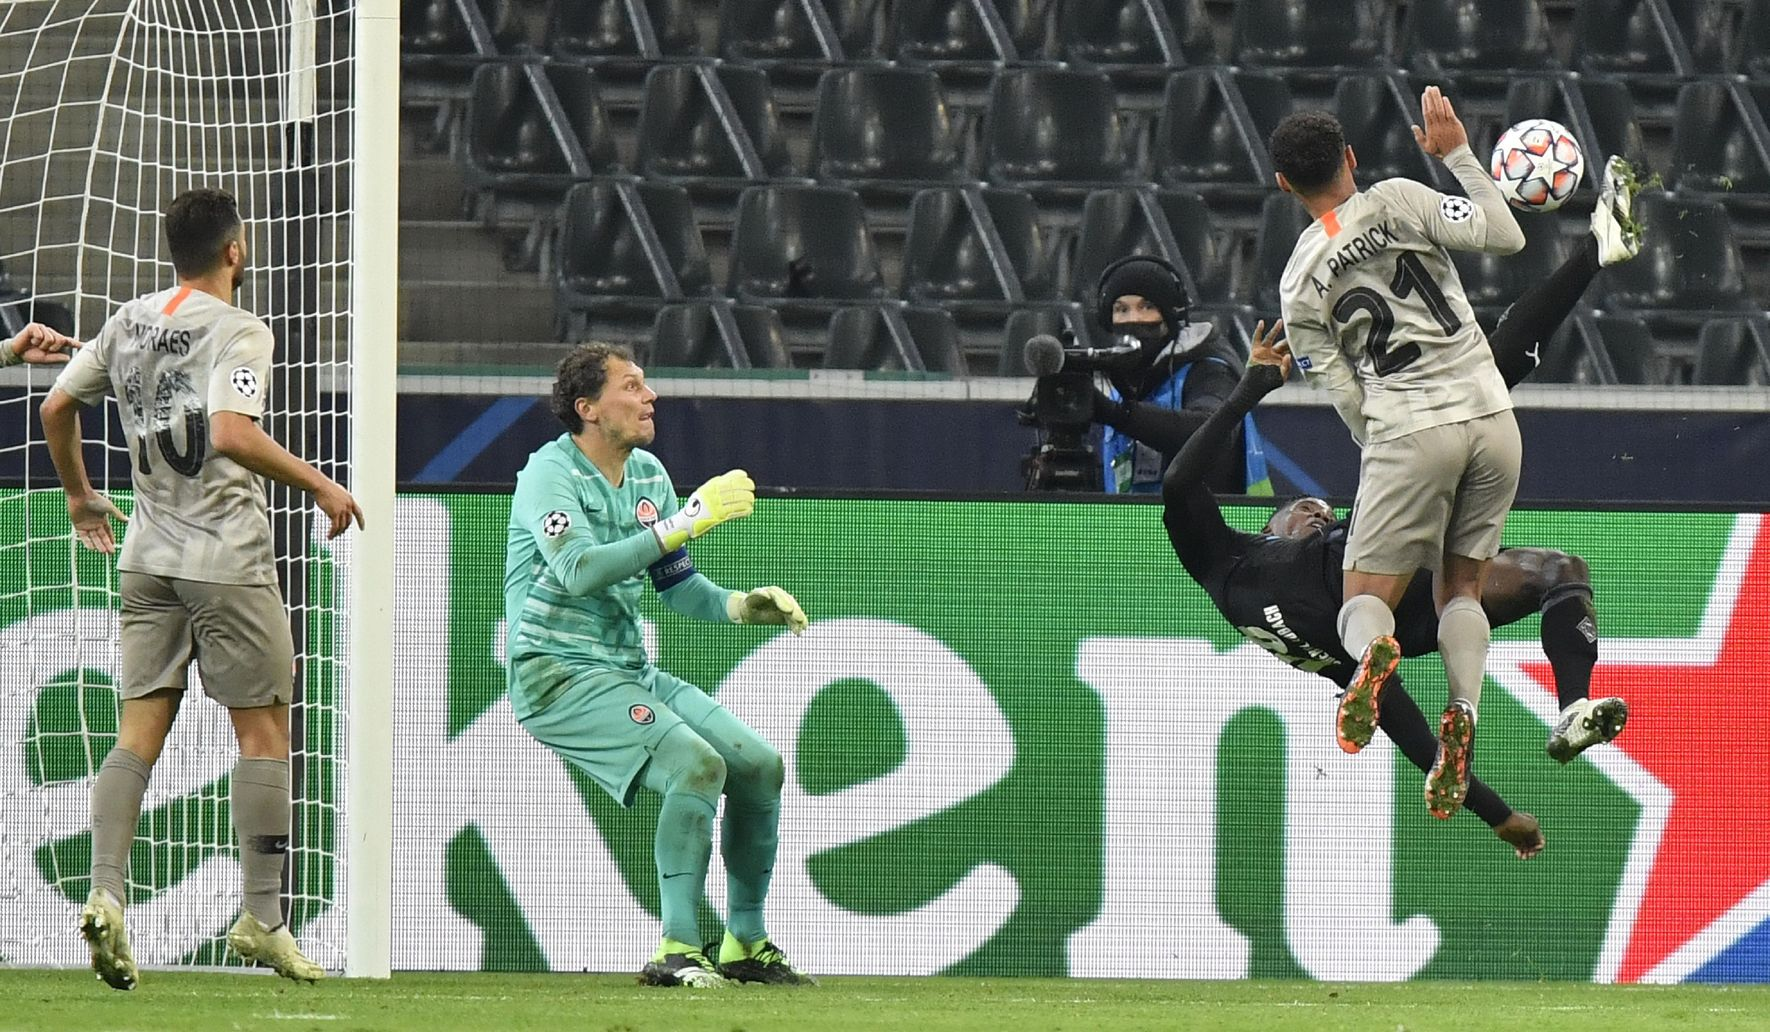 Germany_soccer_champions_league_84523_c0-233-5568-3479_s1770x1032